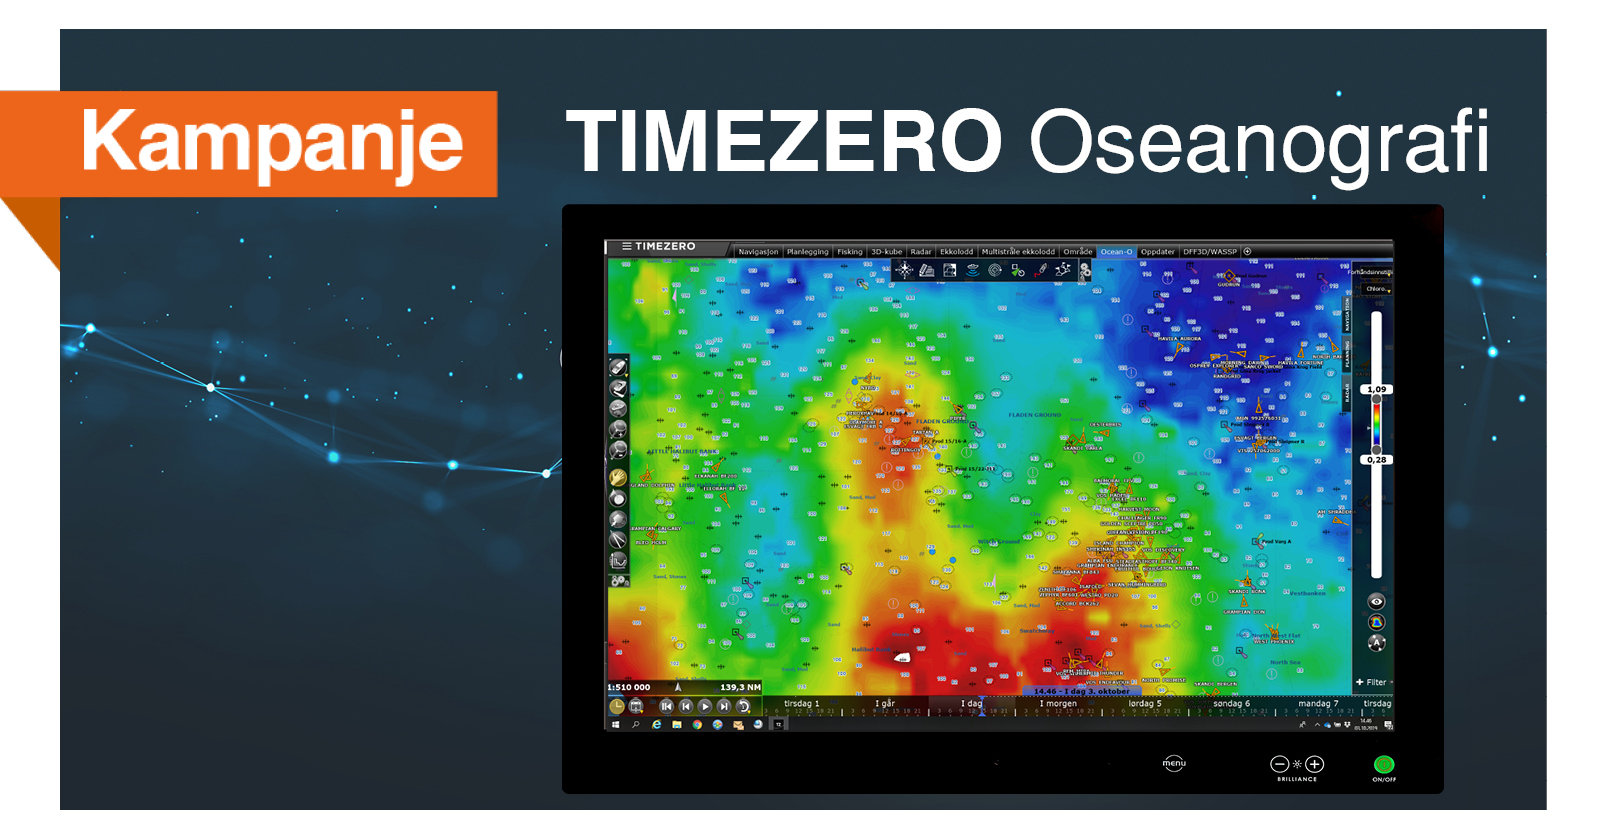 TimeZero Kampanje – Oseanografi